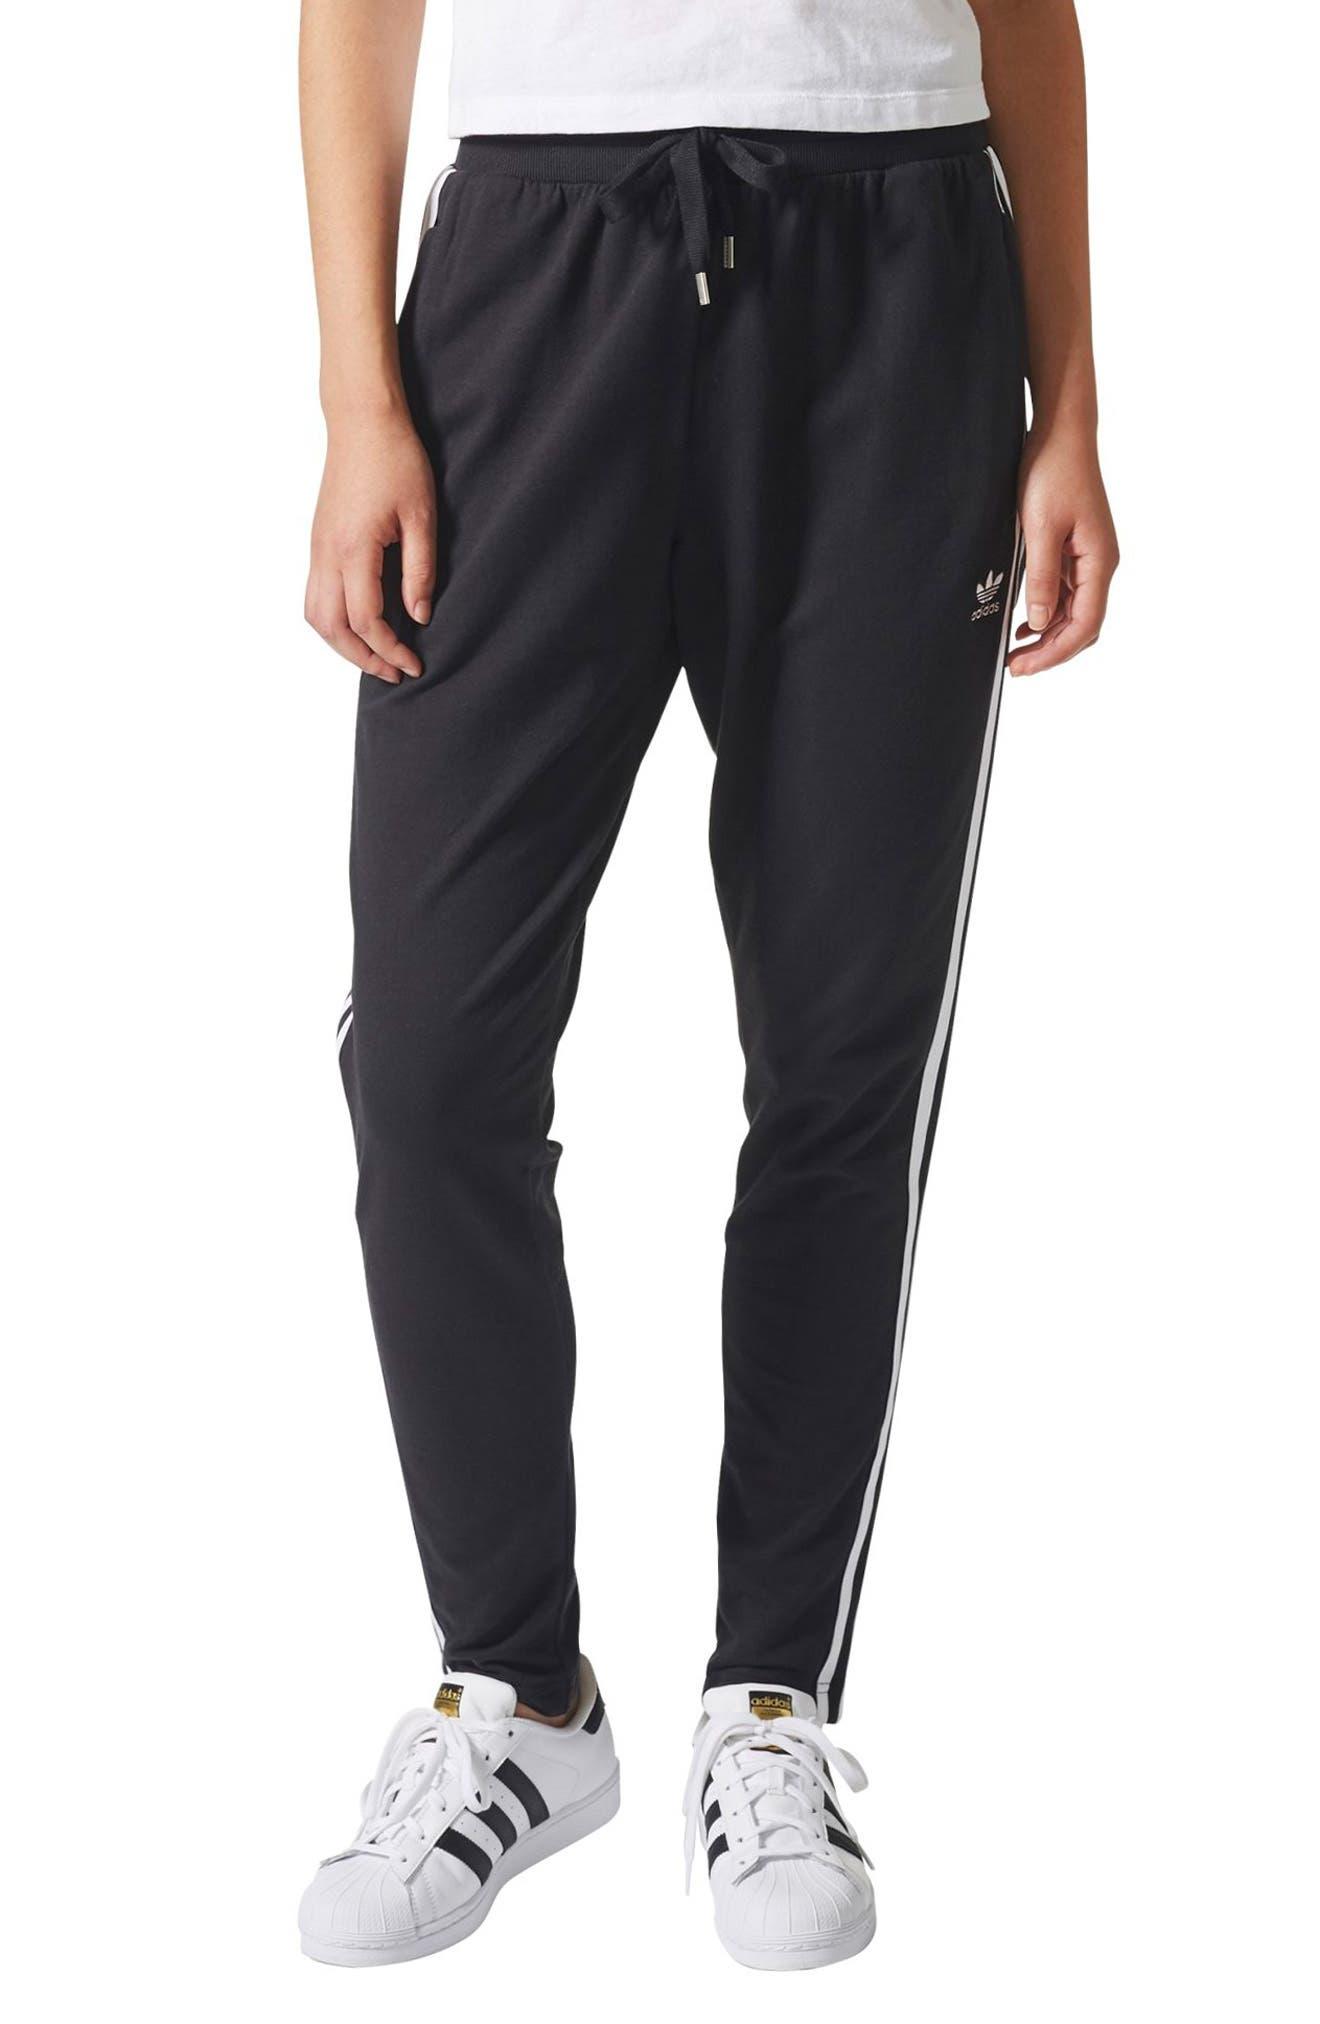 3-Stripes Tapered Pants,                         Main,                         color, Black